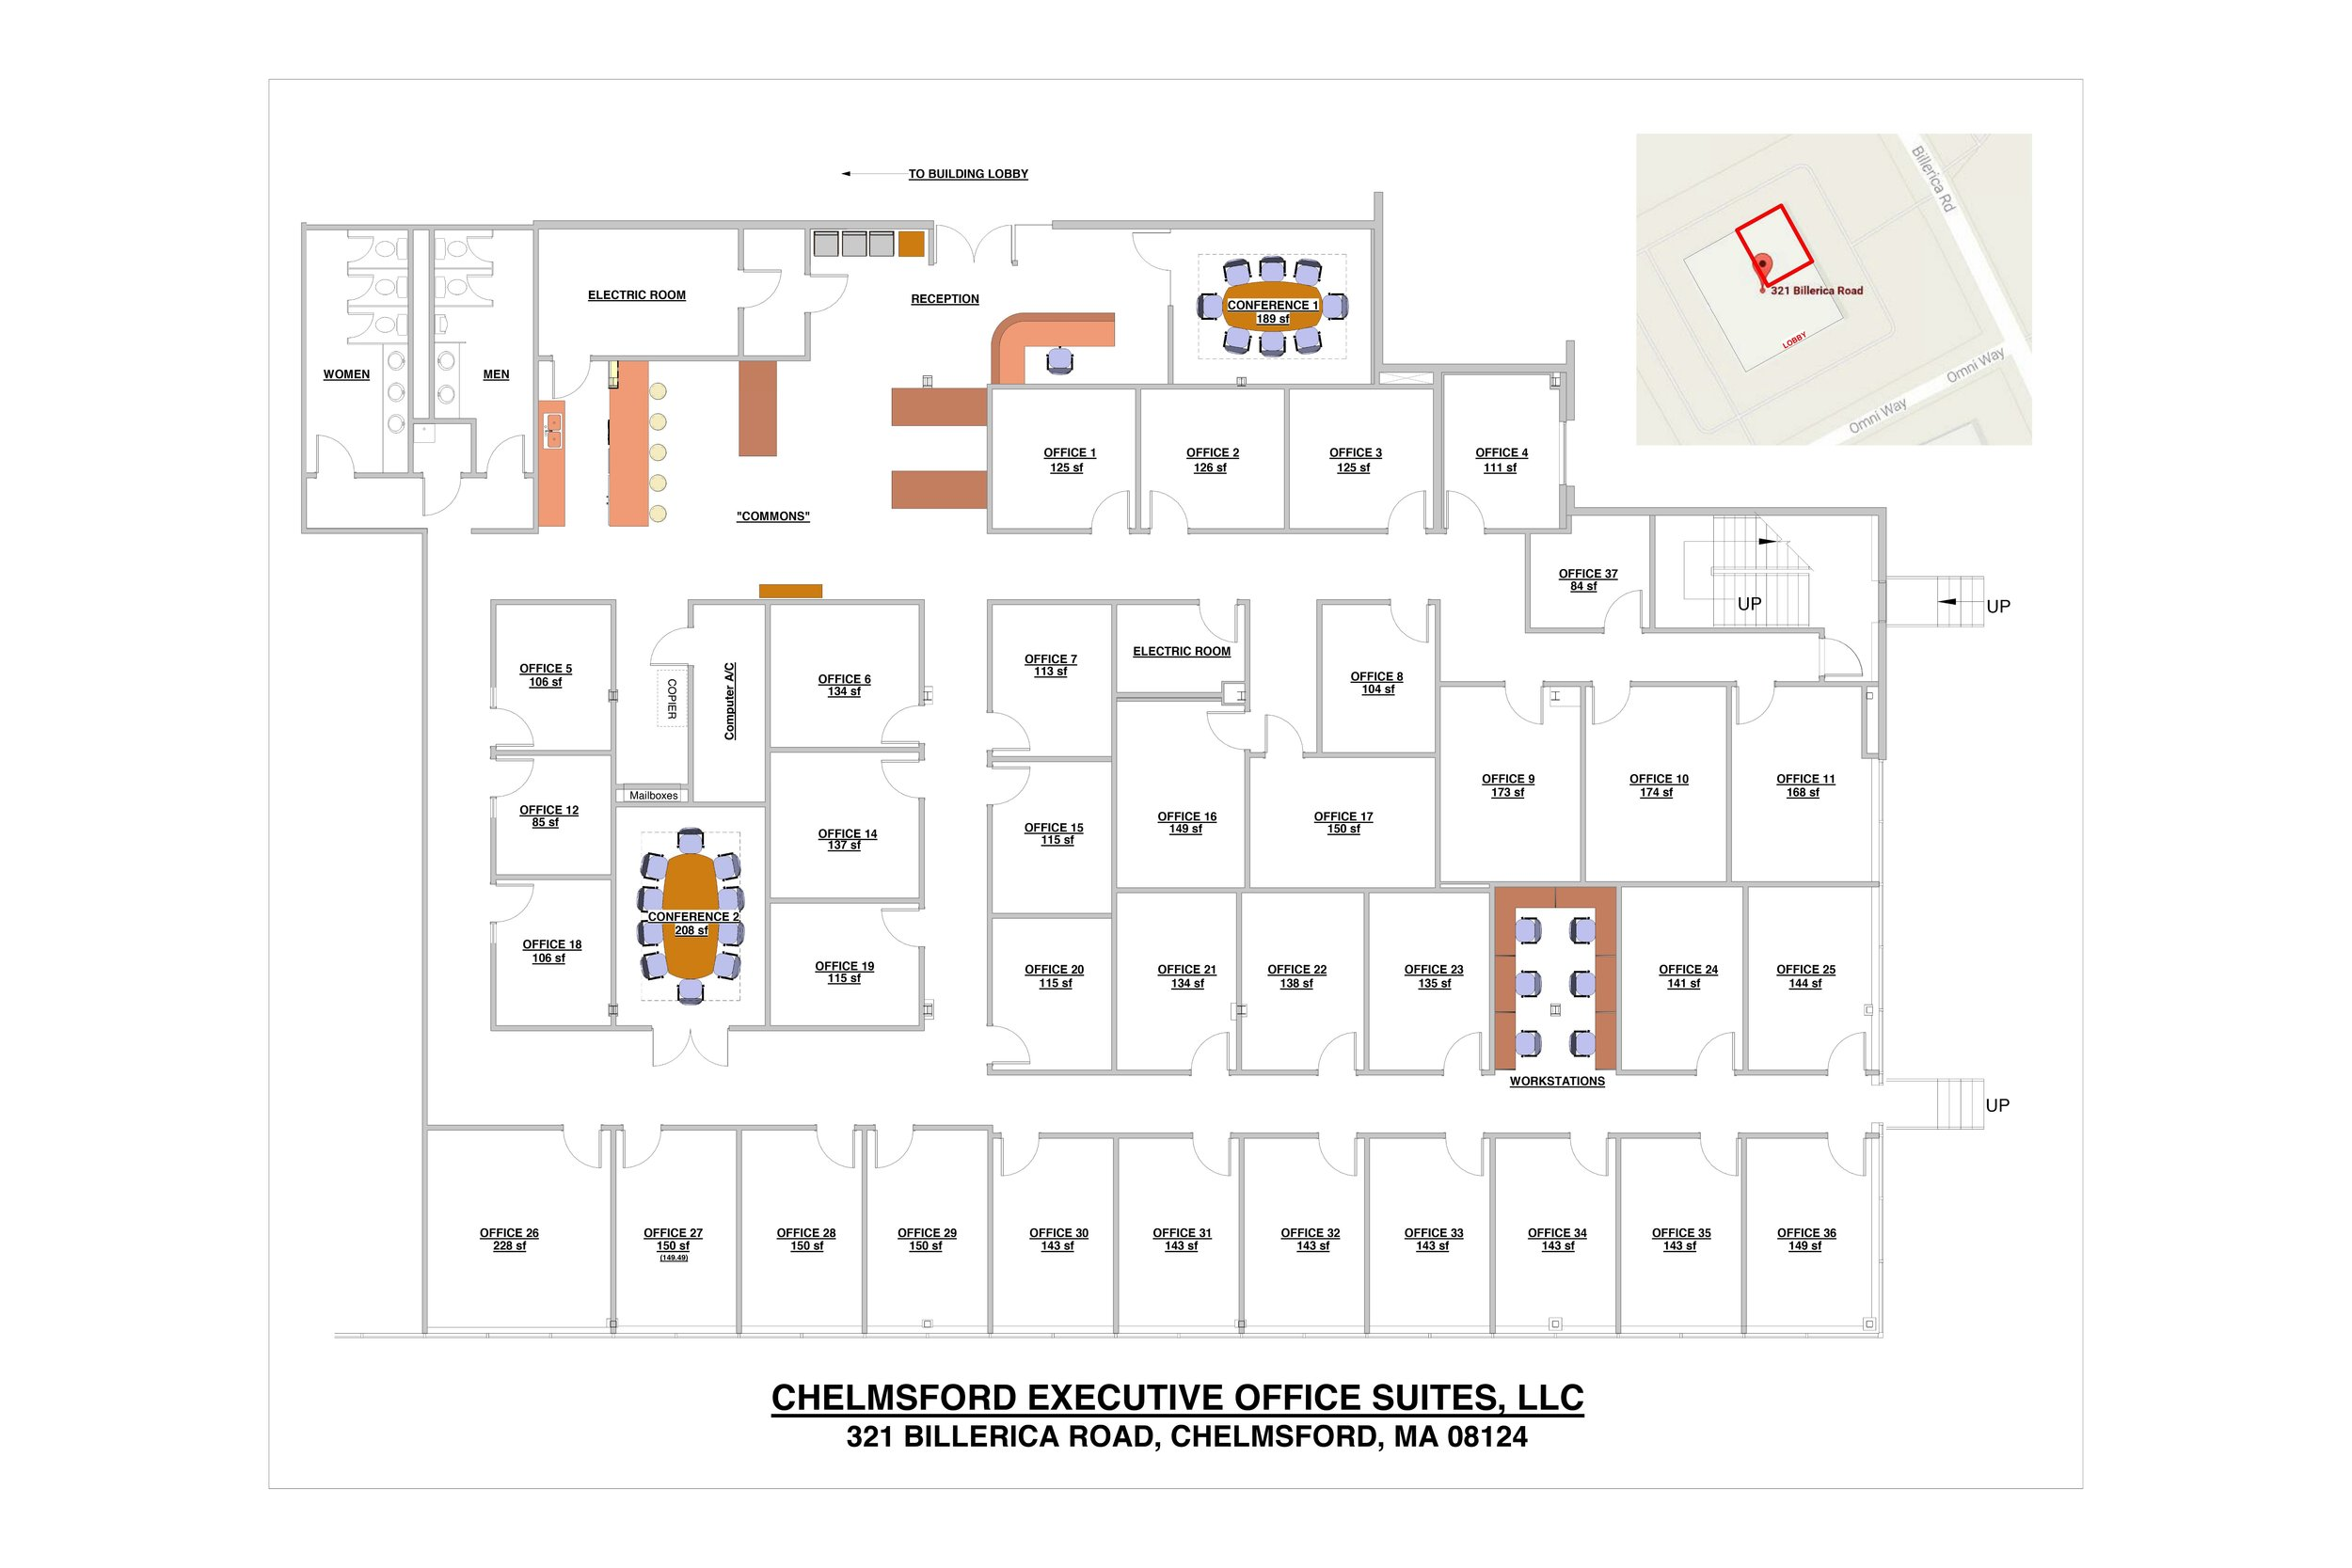 Chelmsford floorplan resized.jpg